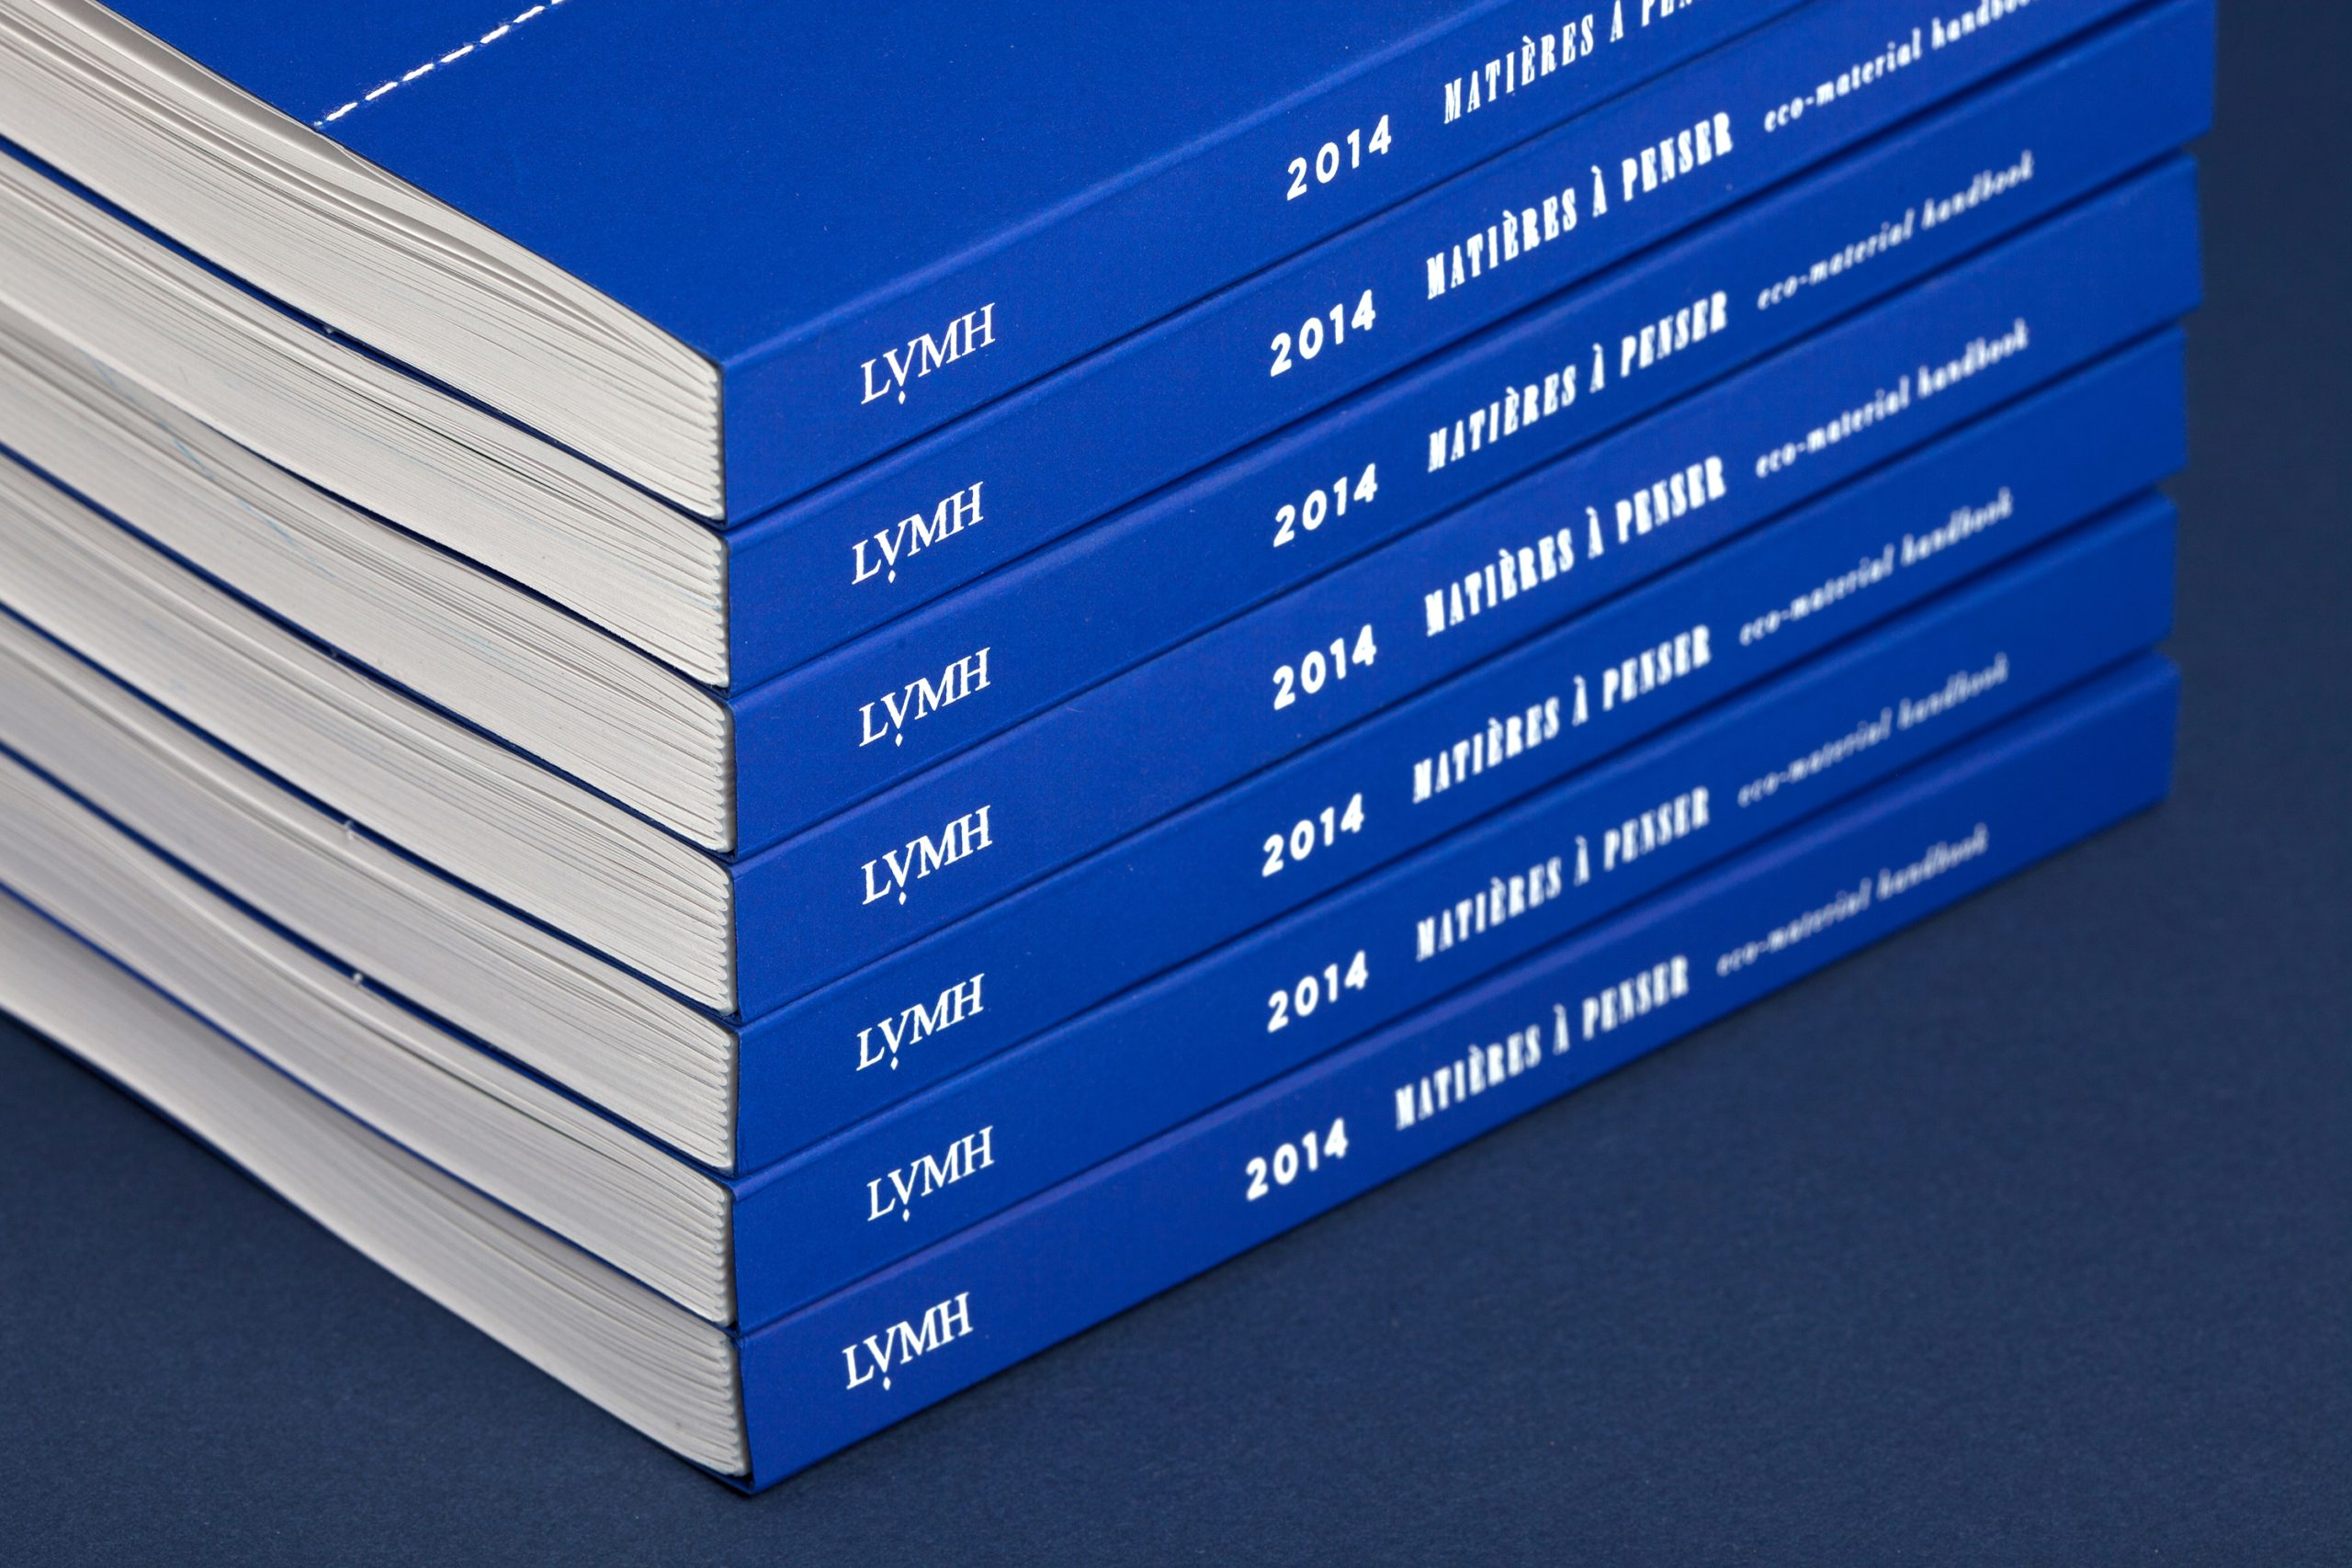 livres LVMH eco-conception